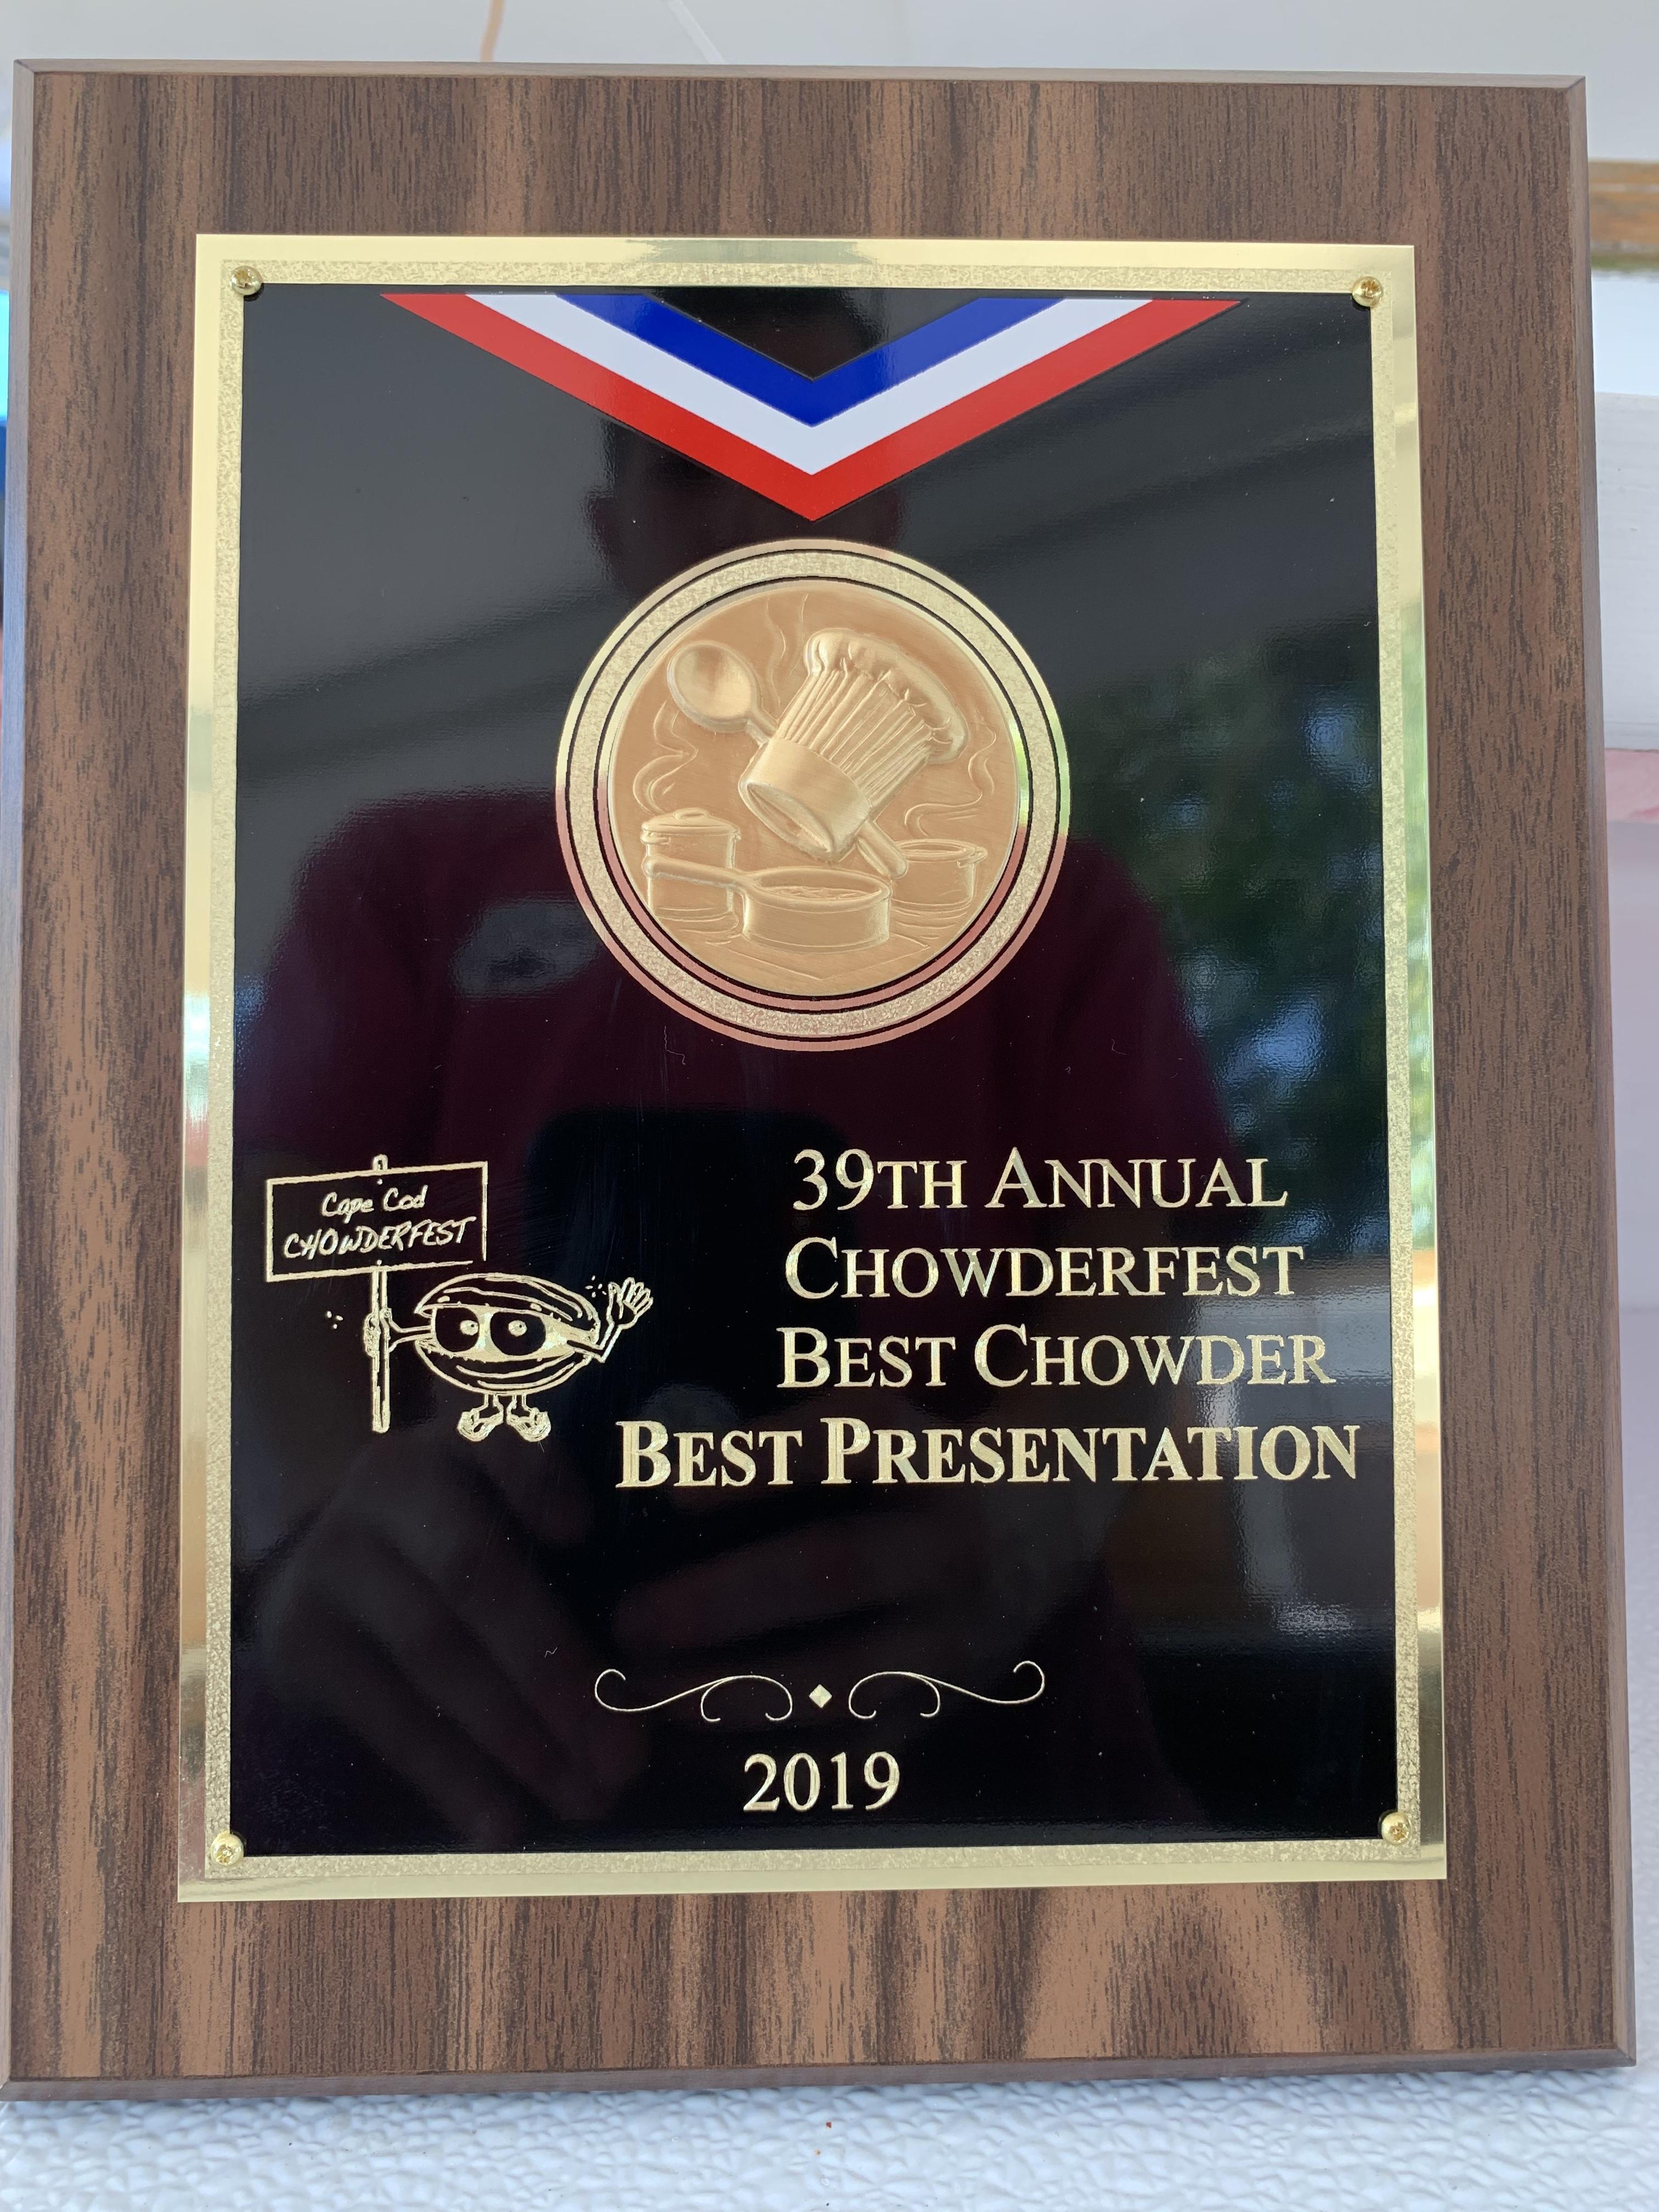 Chowderfest award